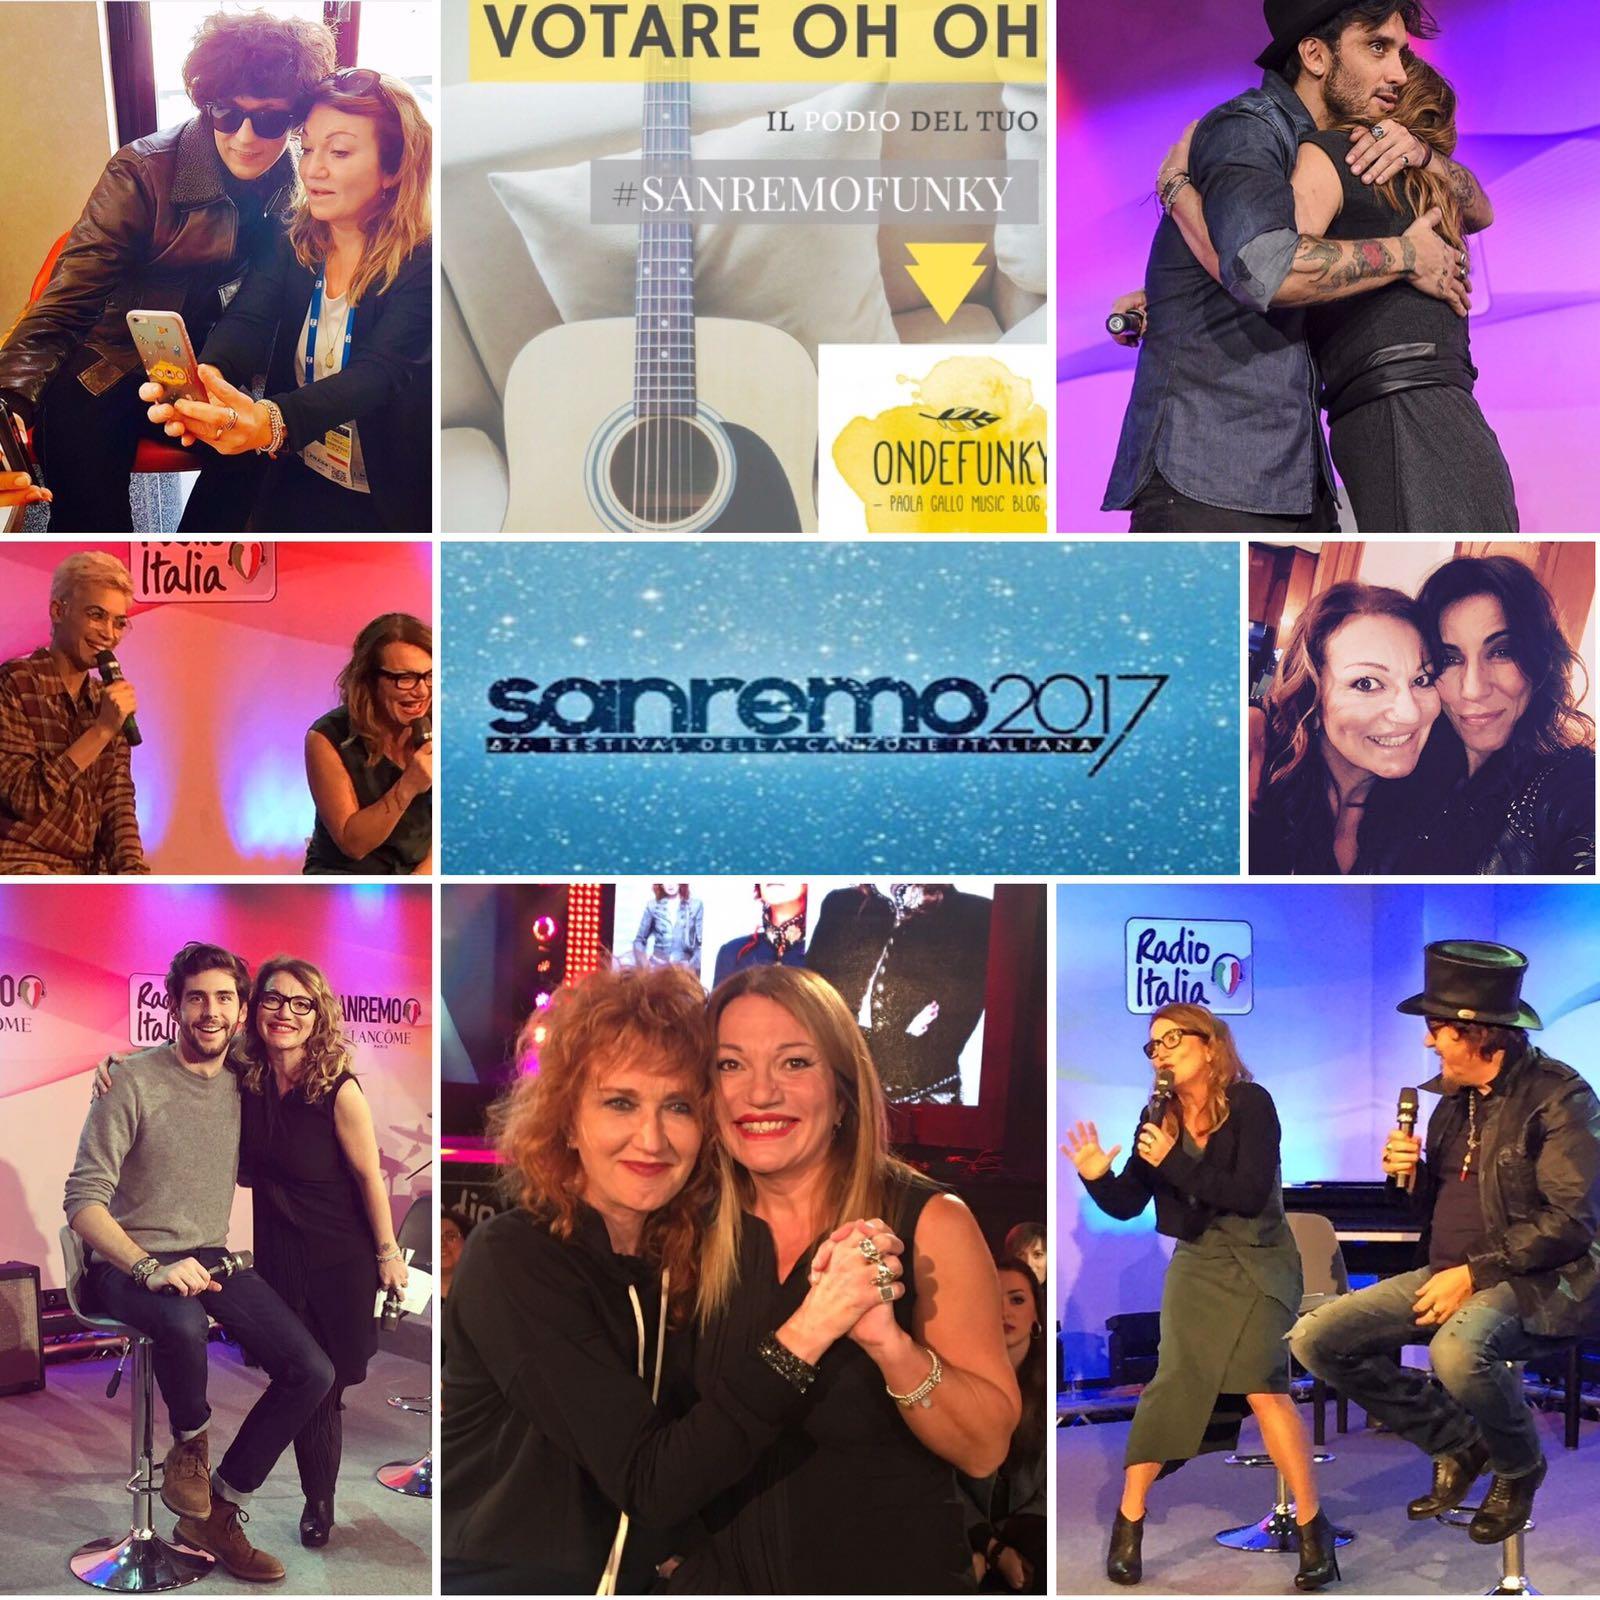 #SanremoFunky ultima puntata <BR> I miei promossi